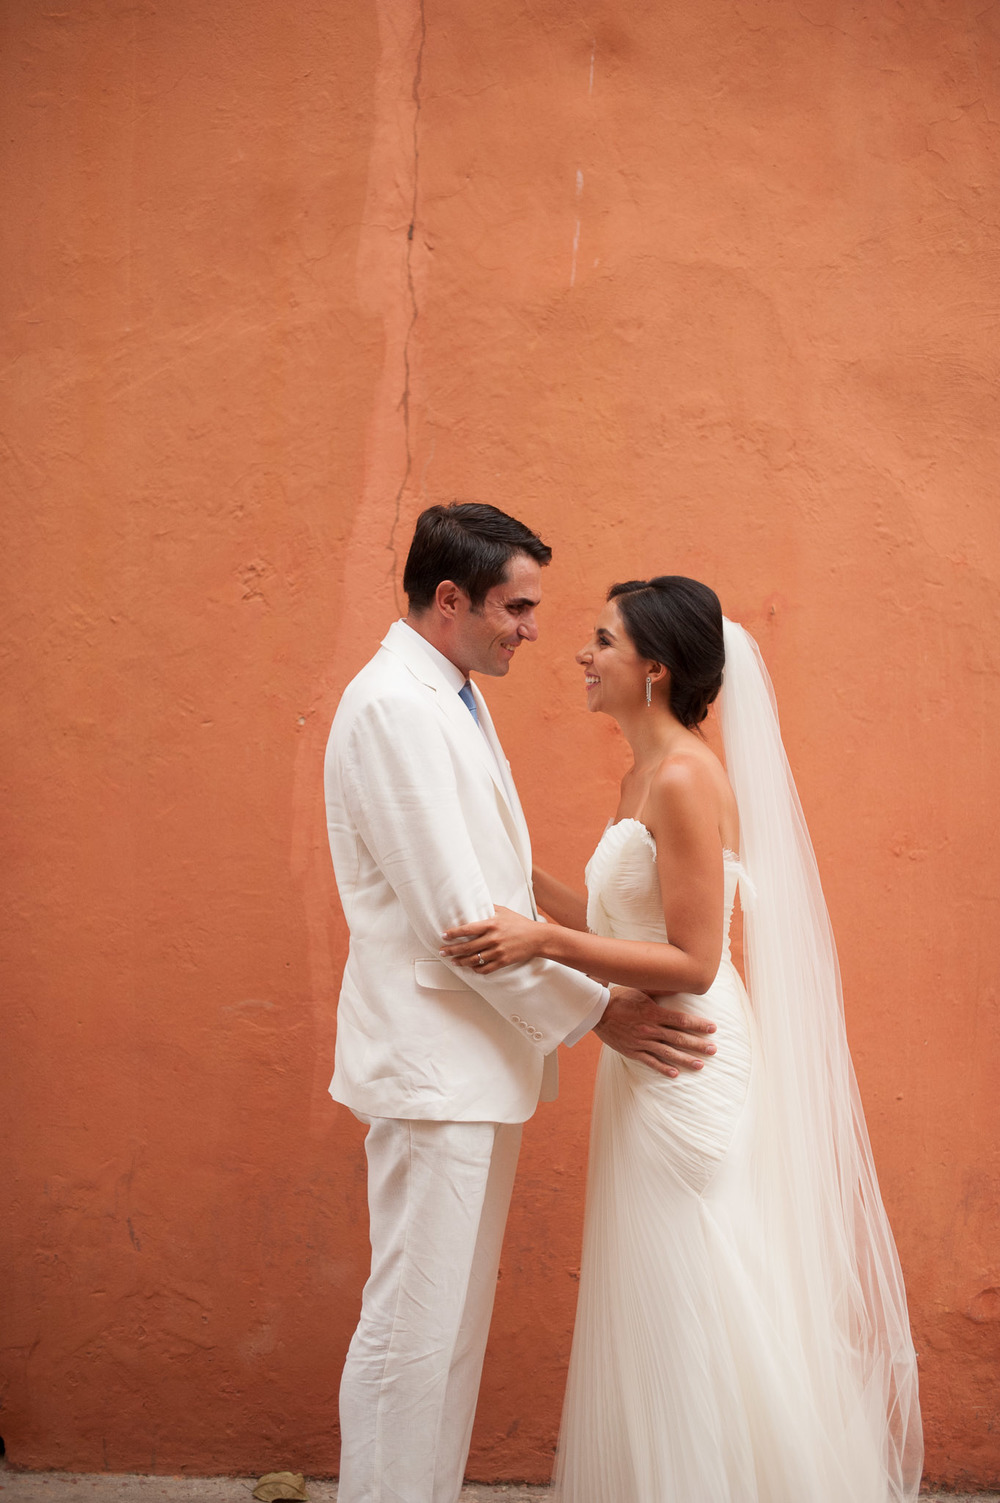 boda en cartagena_pablosalgado__PSB7278.jpg